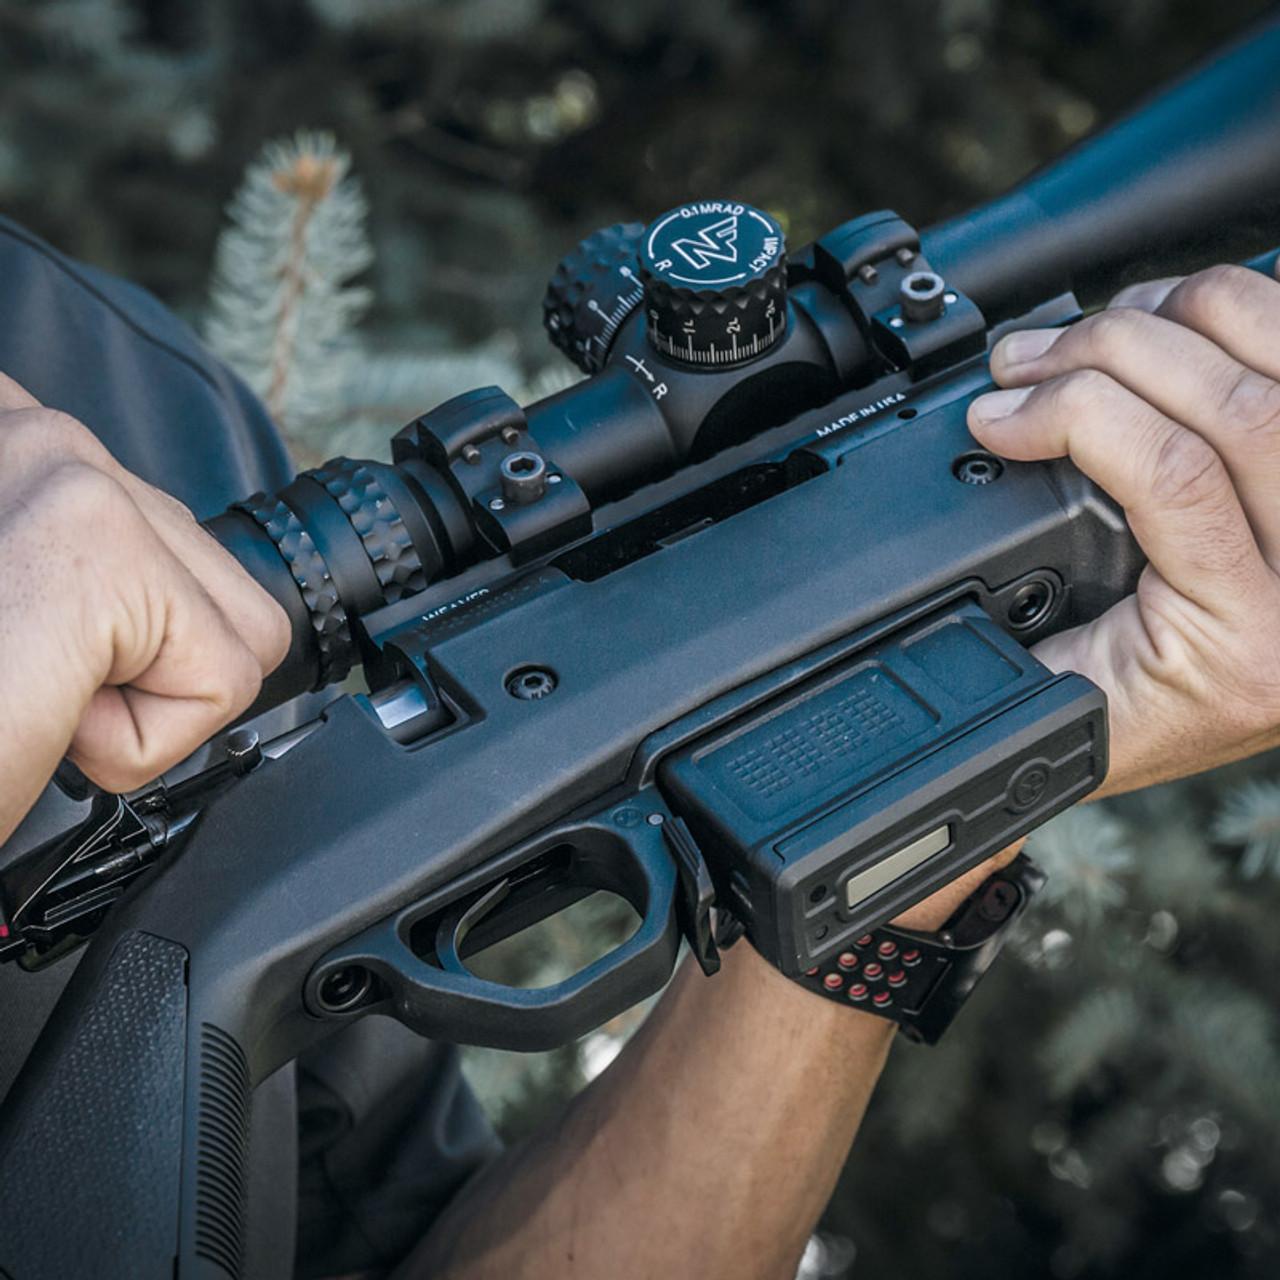 Magpul Hunter 700 Standard Detachable Magazine Well - AICS short action